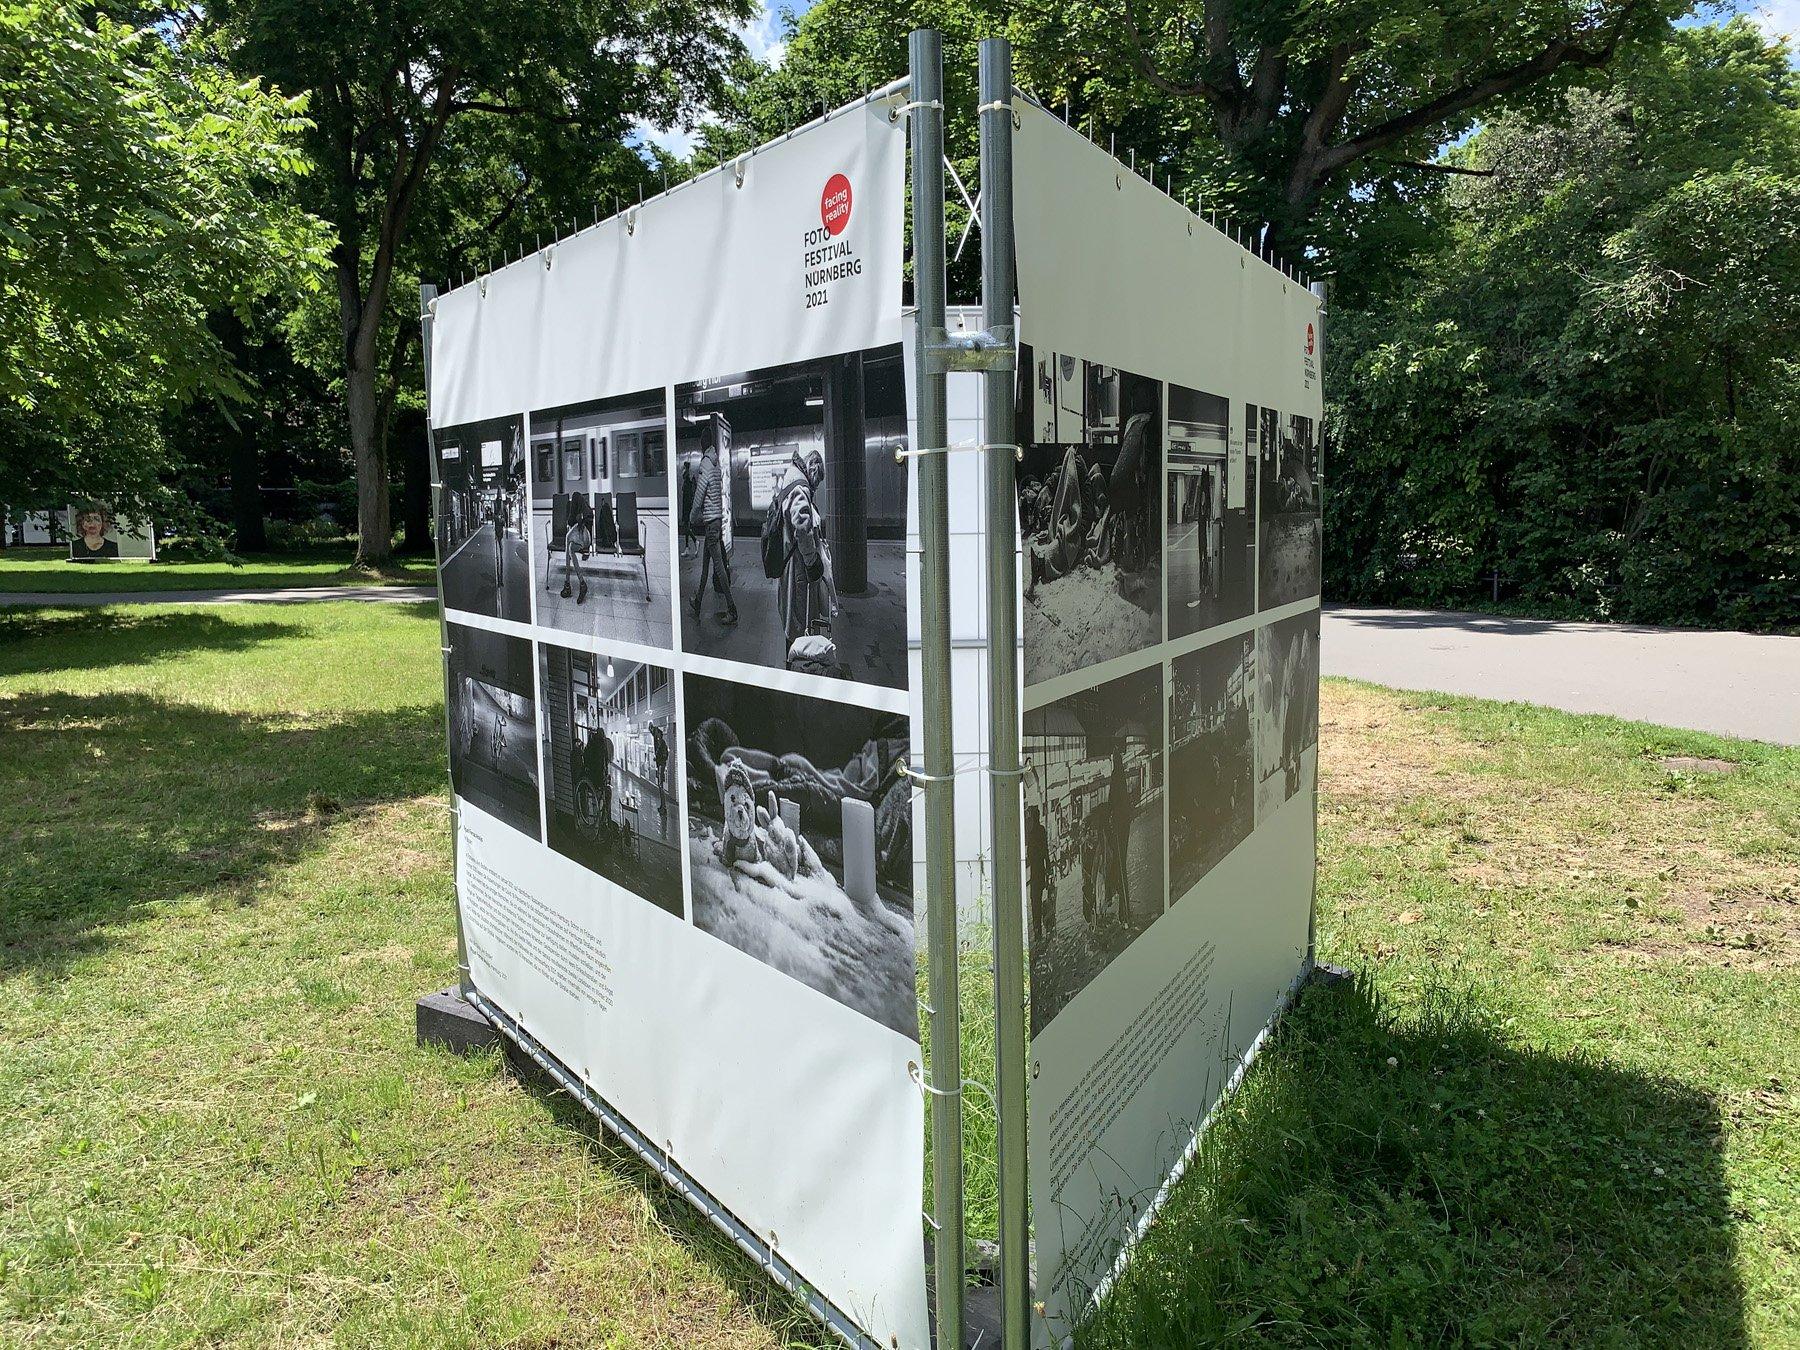 Fotofestival Nürnberg 2021 – facing reality